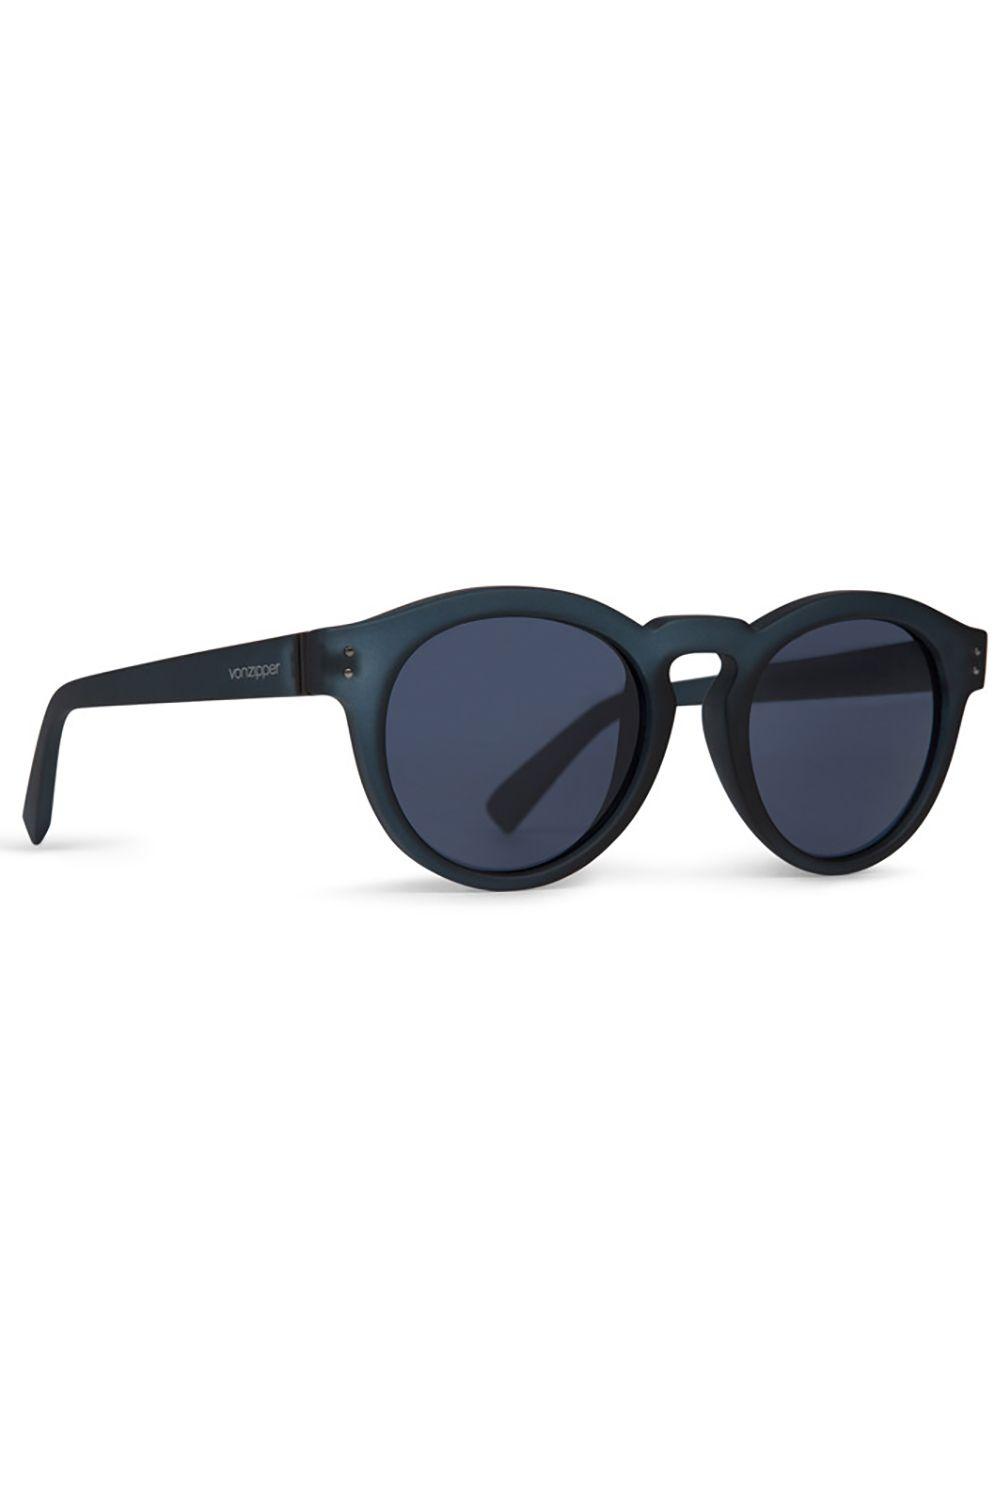 VonZipper Sunglasses DITTY Navy Satin / Grey-Blue